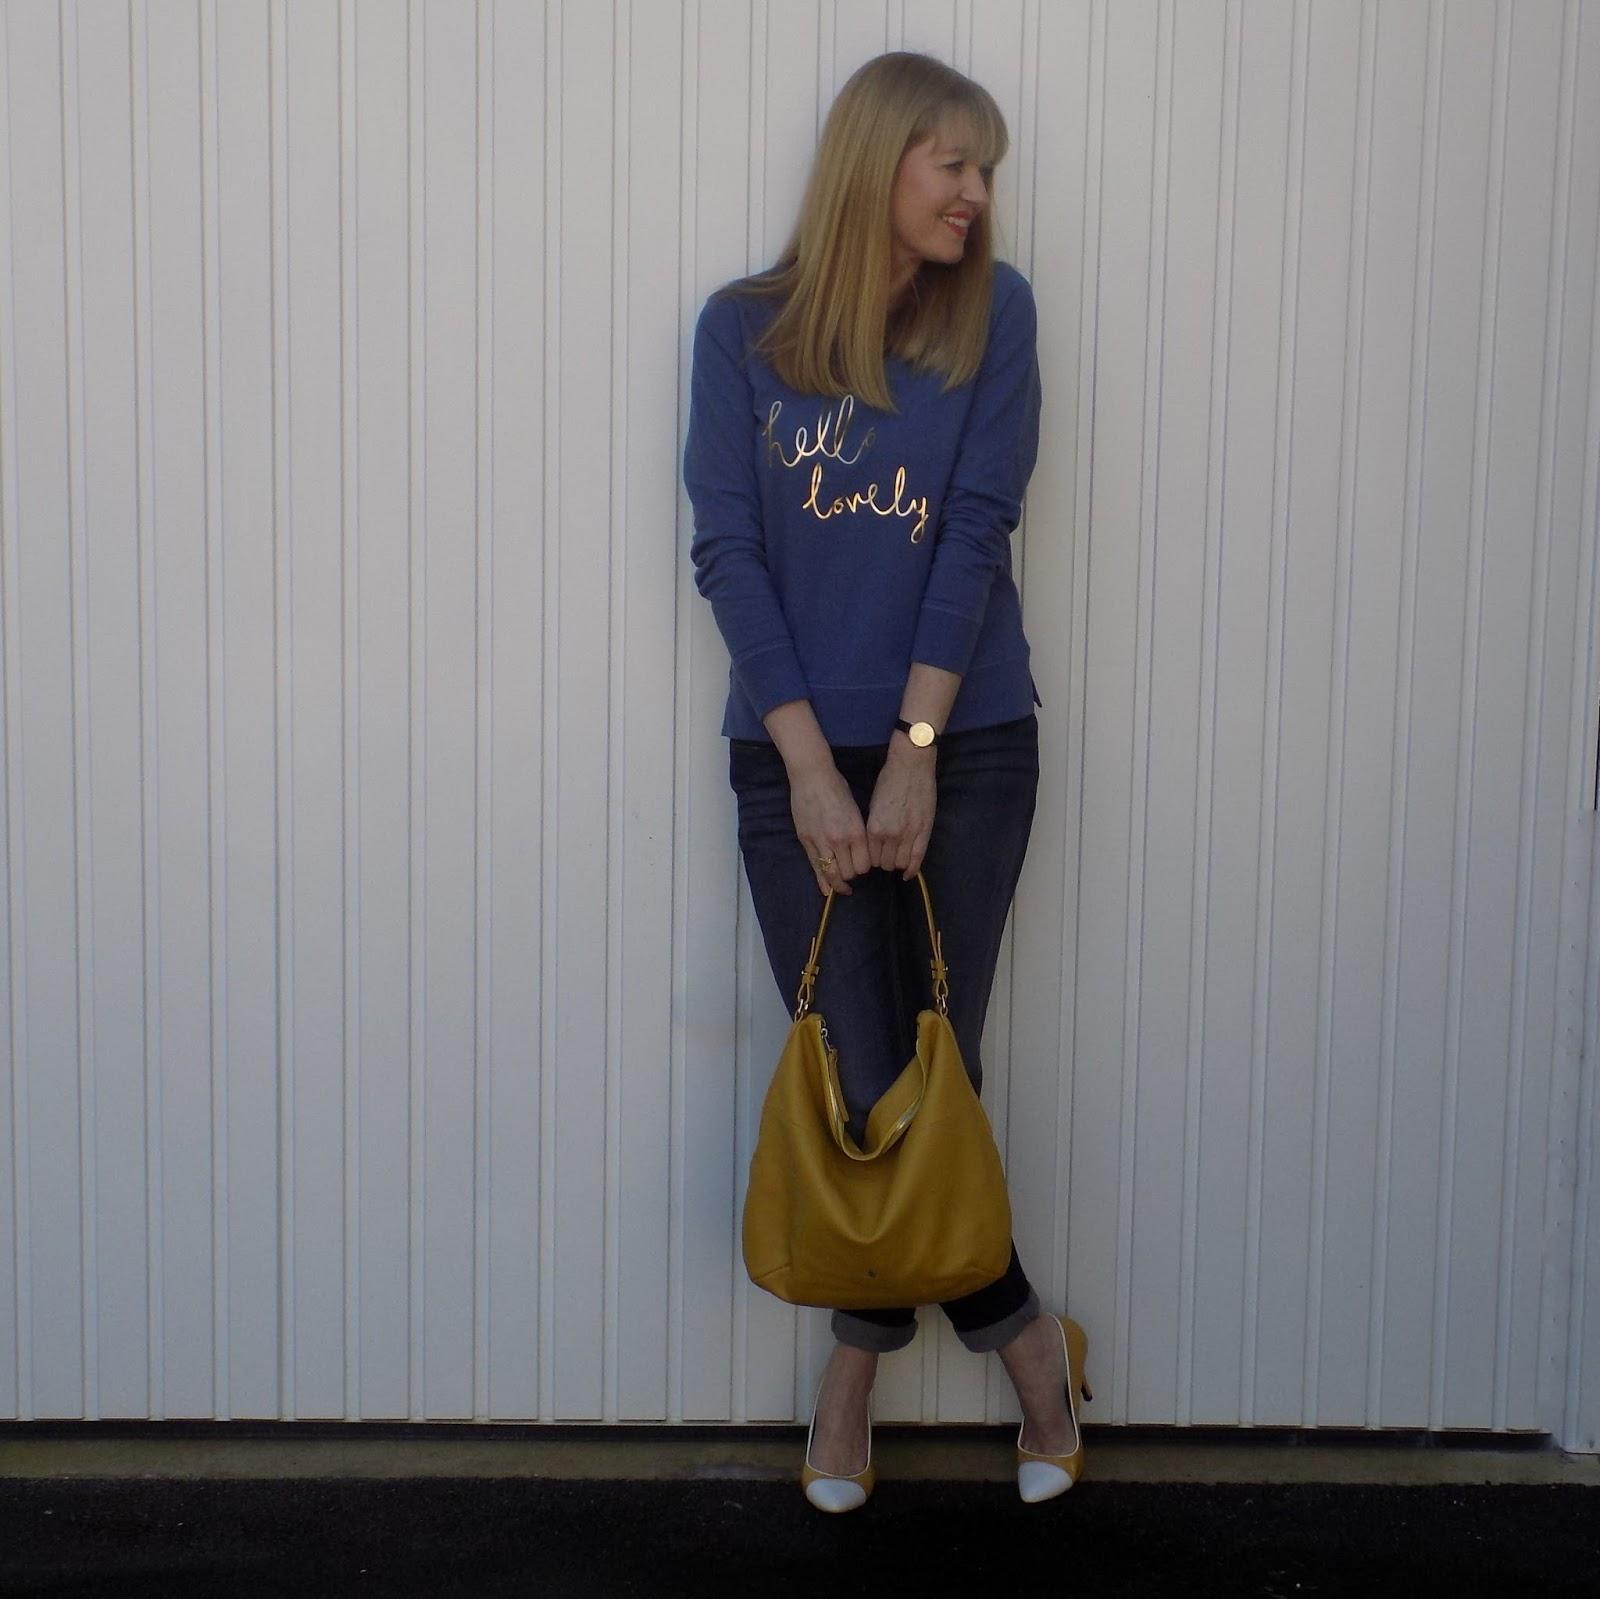 Boden slogan sweatshirt, boyfriend jeans, Yull Chartwell shoes